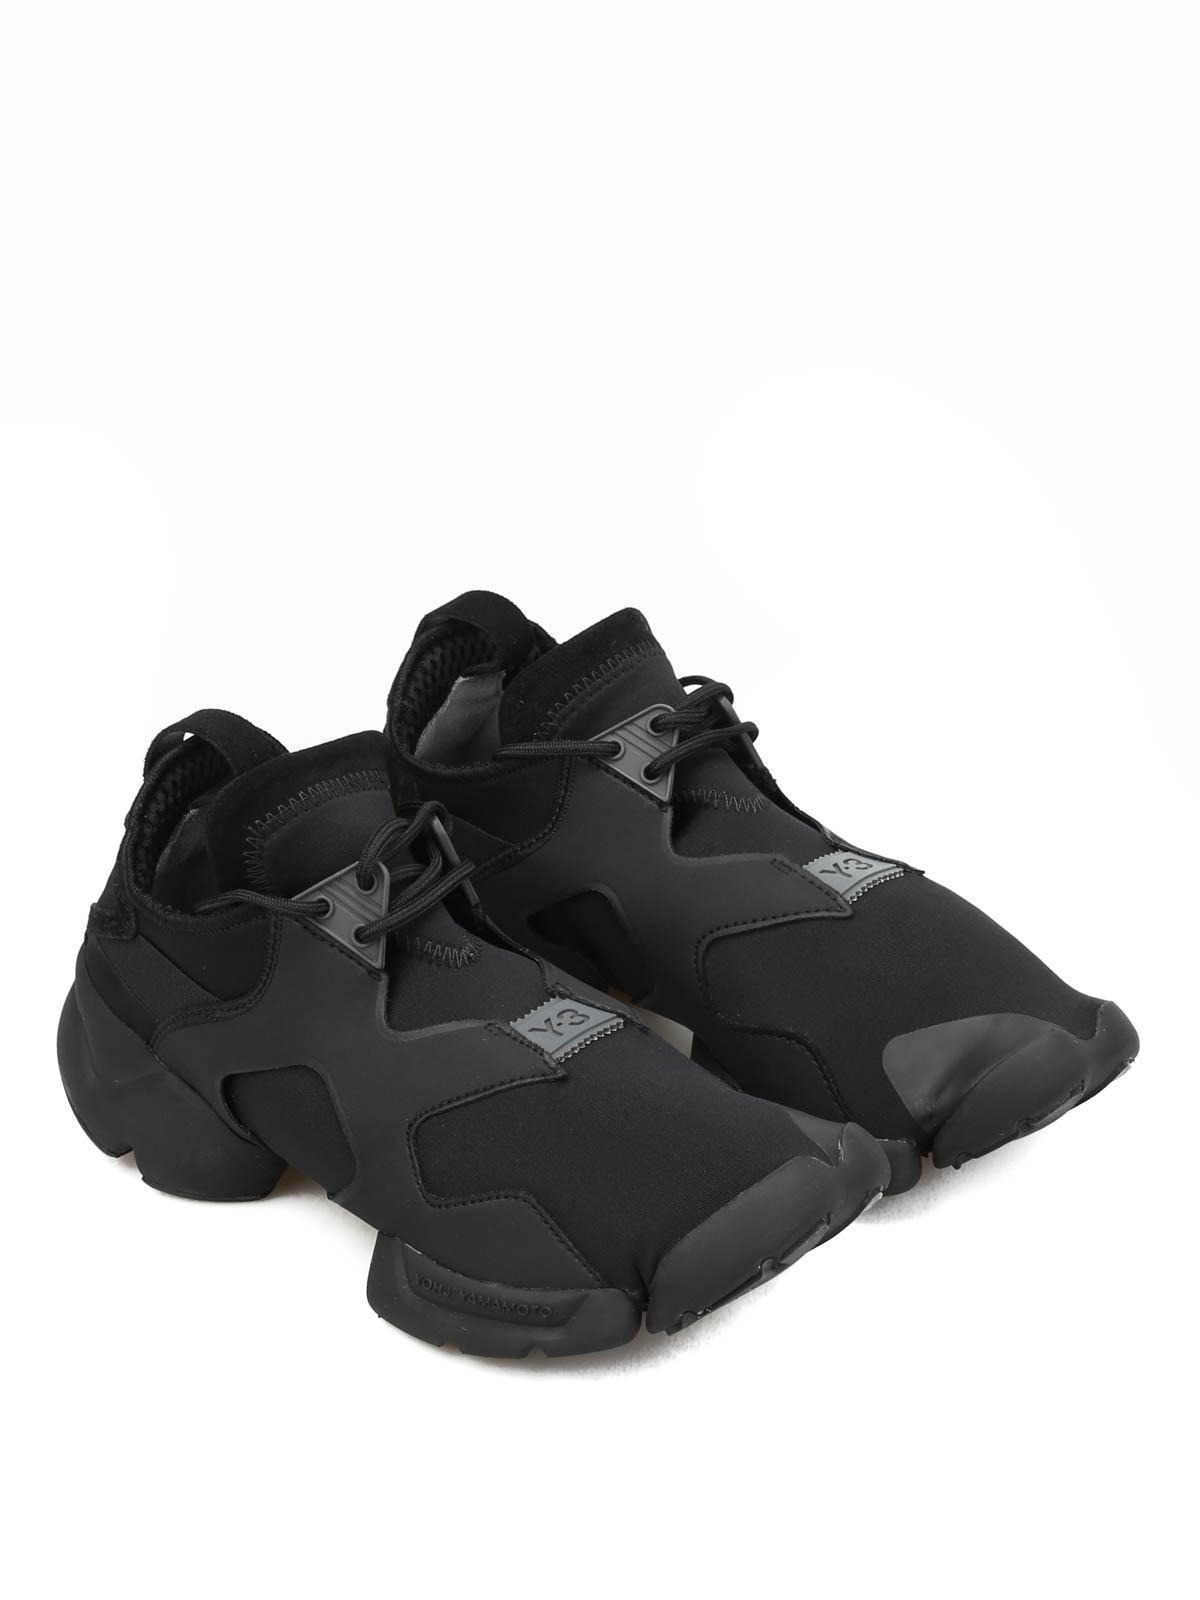 Adidas Y-3 - Kohna sneakers - trainers - BB4712  bcdb6421c